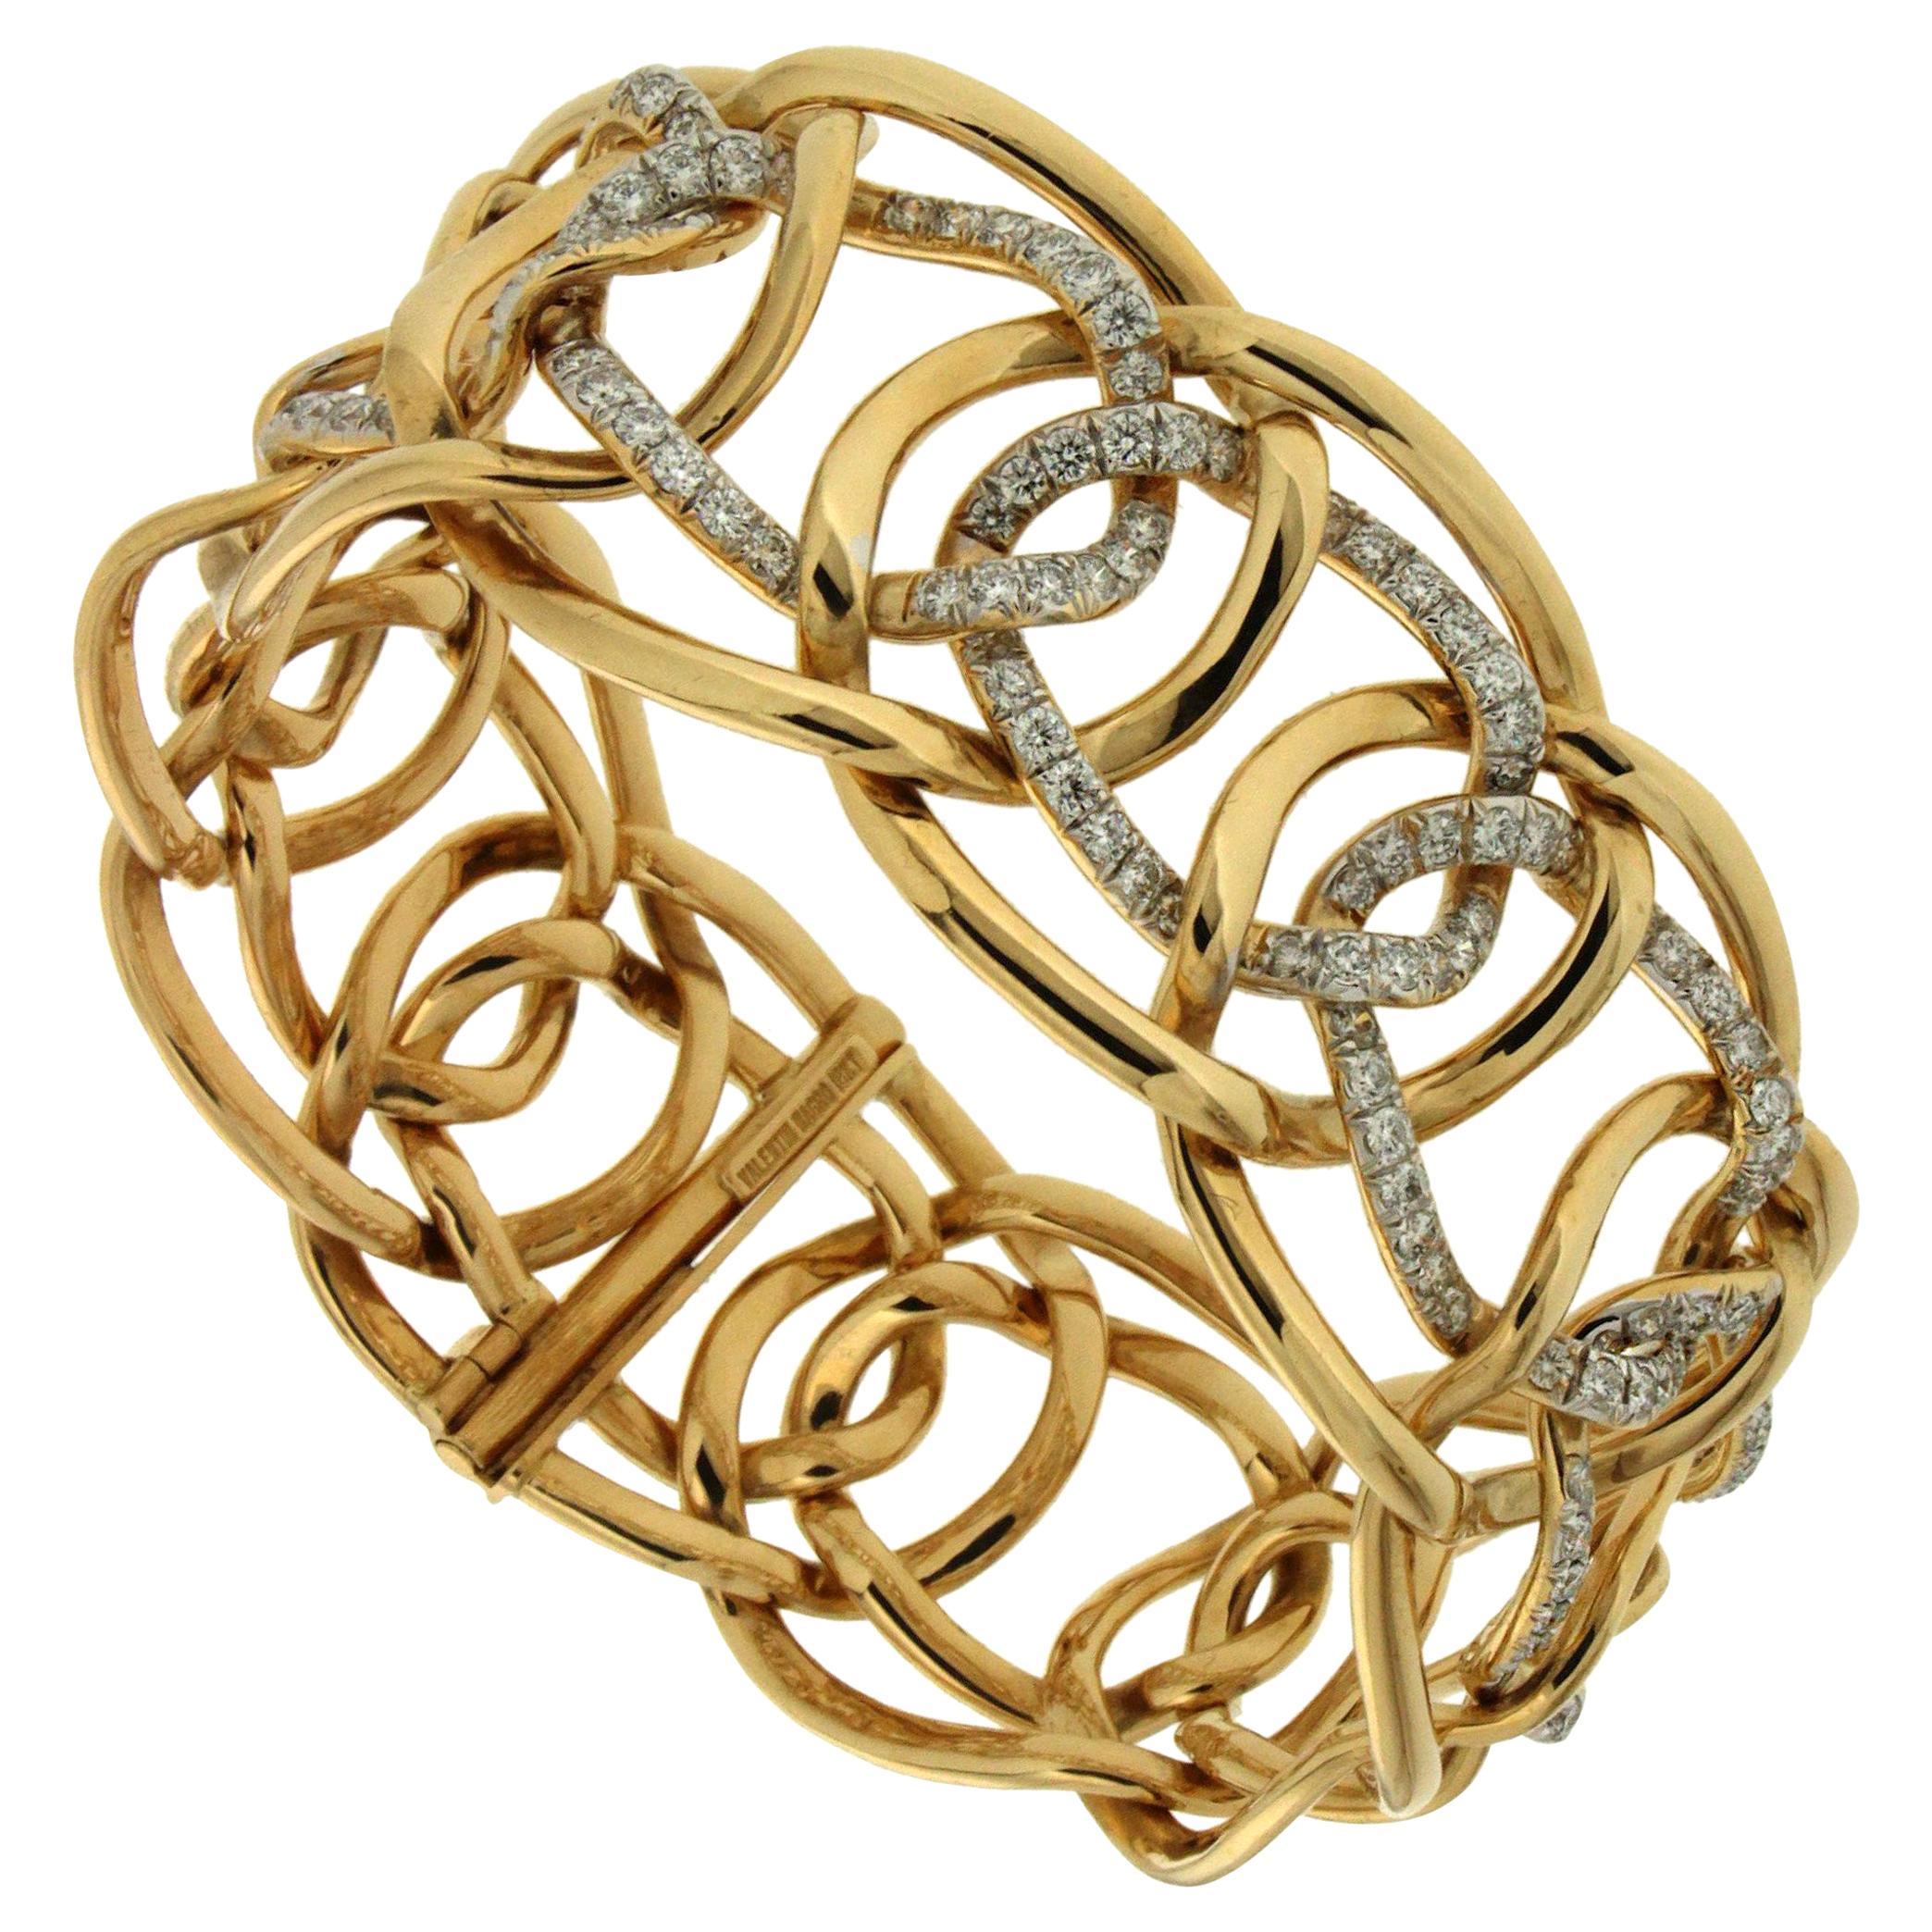 Valentin Magro Interlocking Oval Diamond Gold Link Bracelet